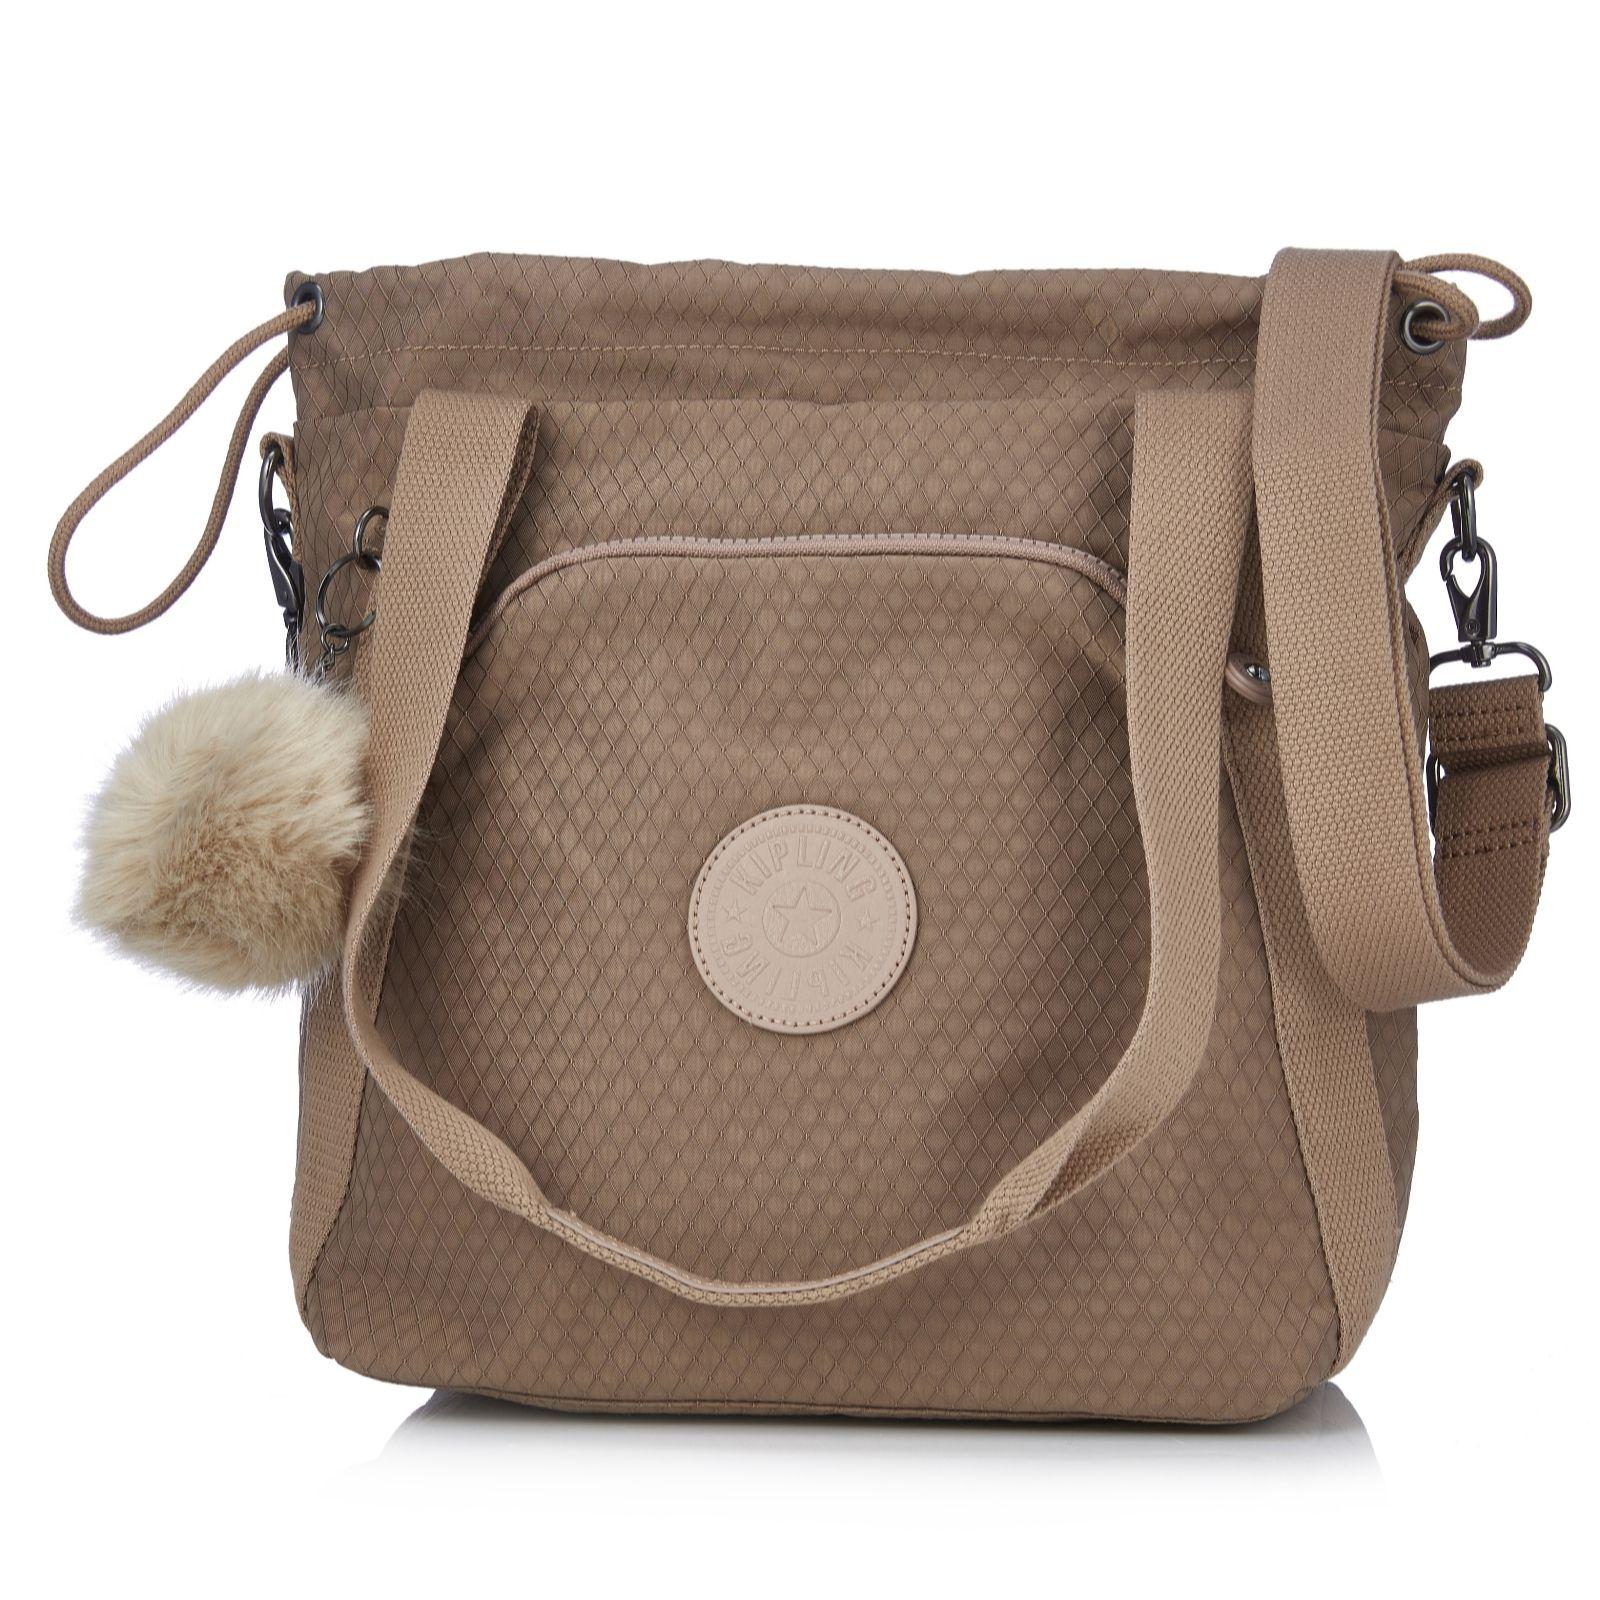 b091c24ed48 Kipling Nillad Premium Large Shoulder Bag - QVC UK